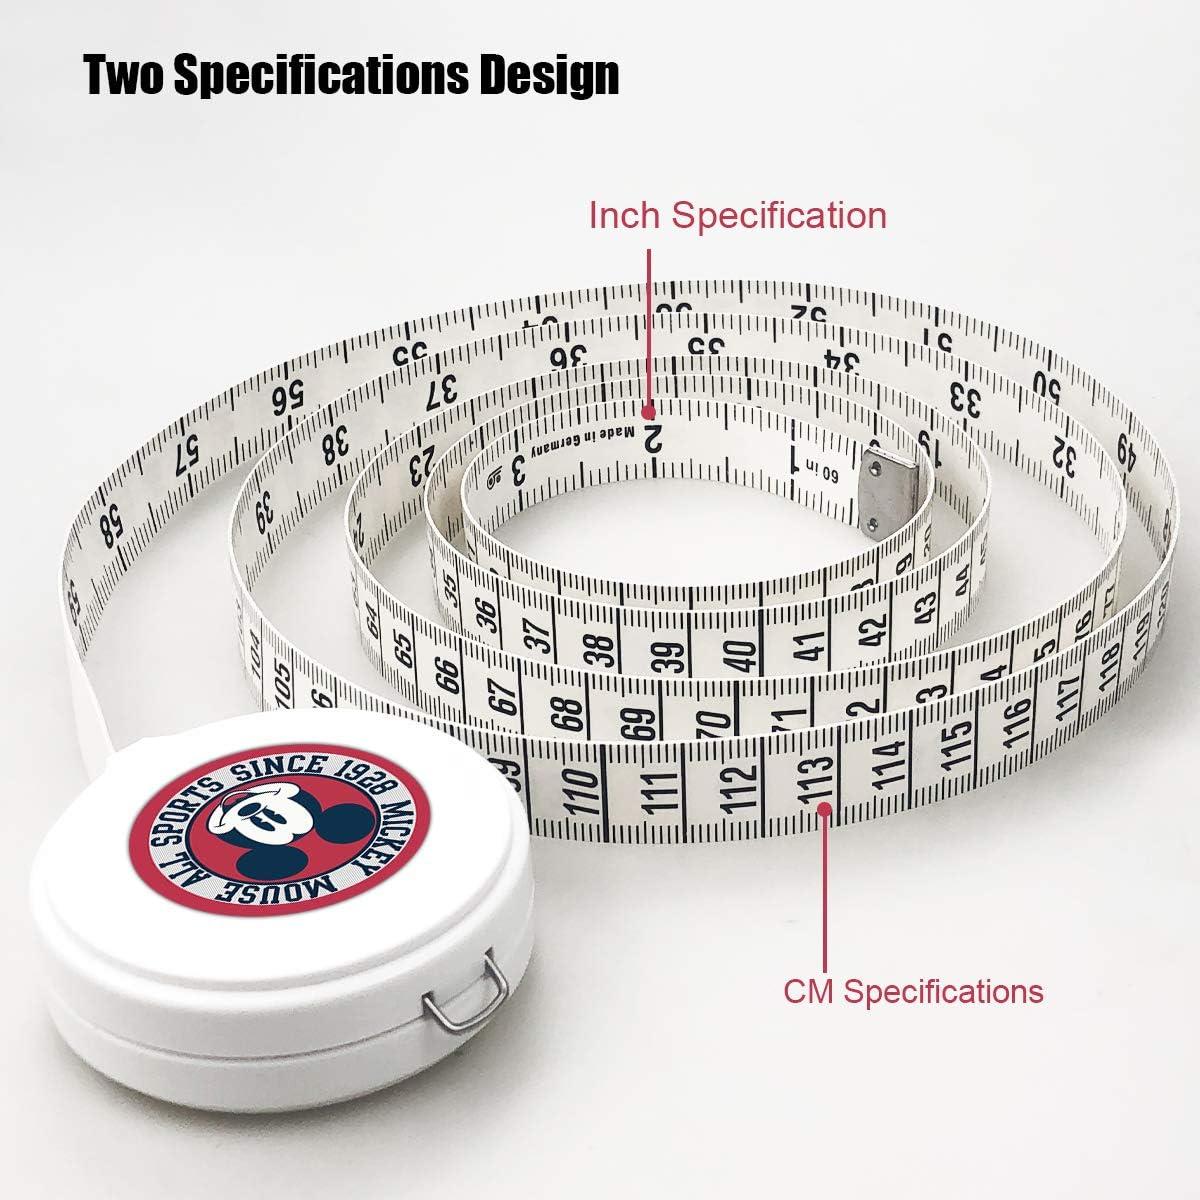 Surmoler Tape Measure 1.5 Meter 60 Inch Push Button Retractable Measuring Tape Measuring Tape for Body Tailor Sewing Craft Cloth Dieting Measuring Tape Disney Mickey